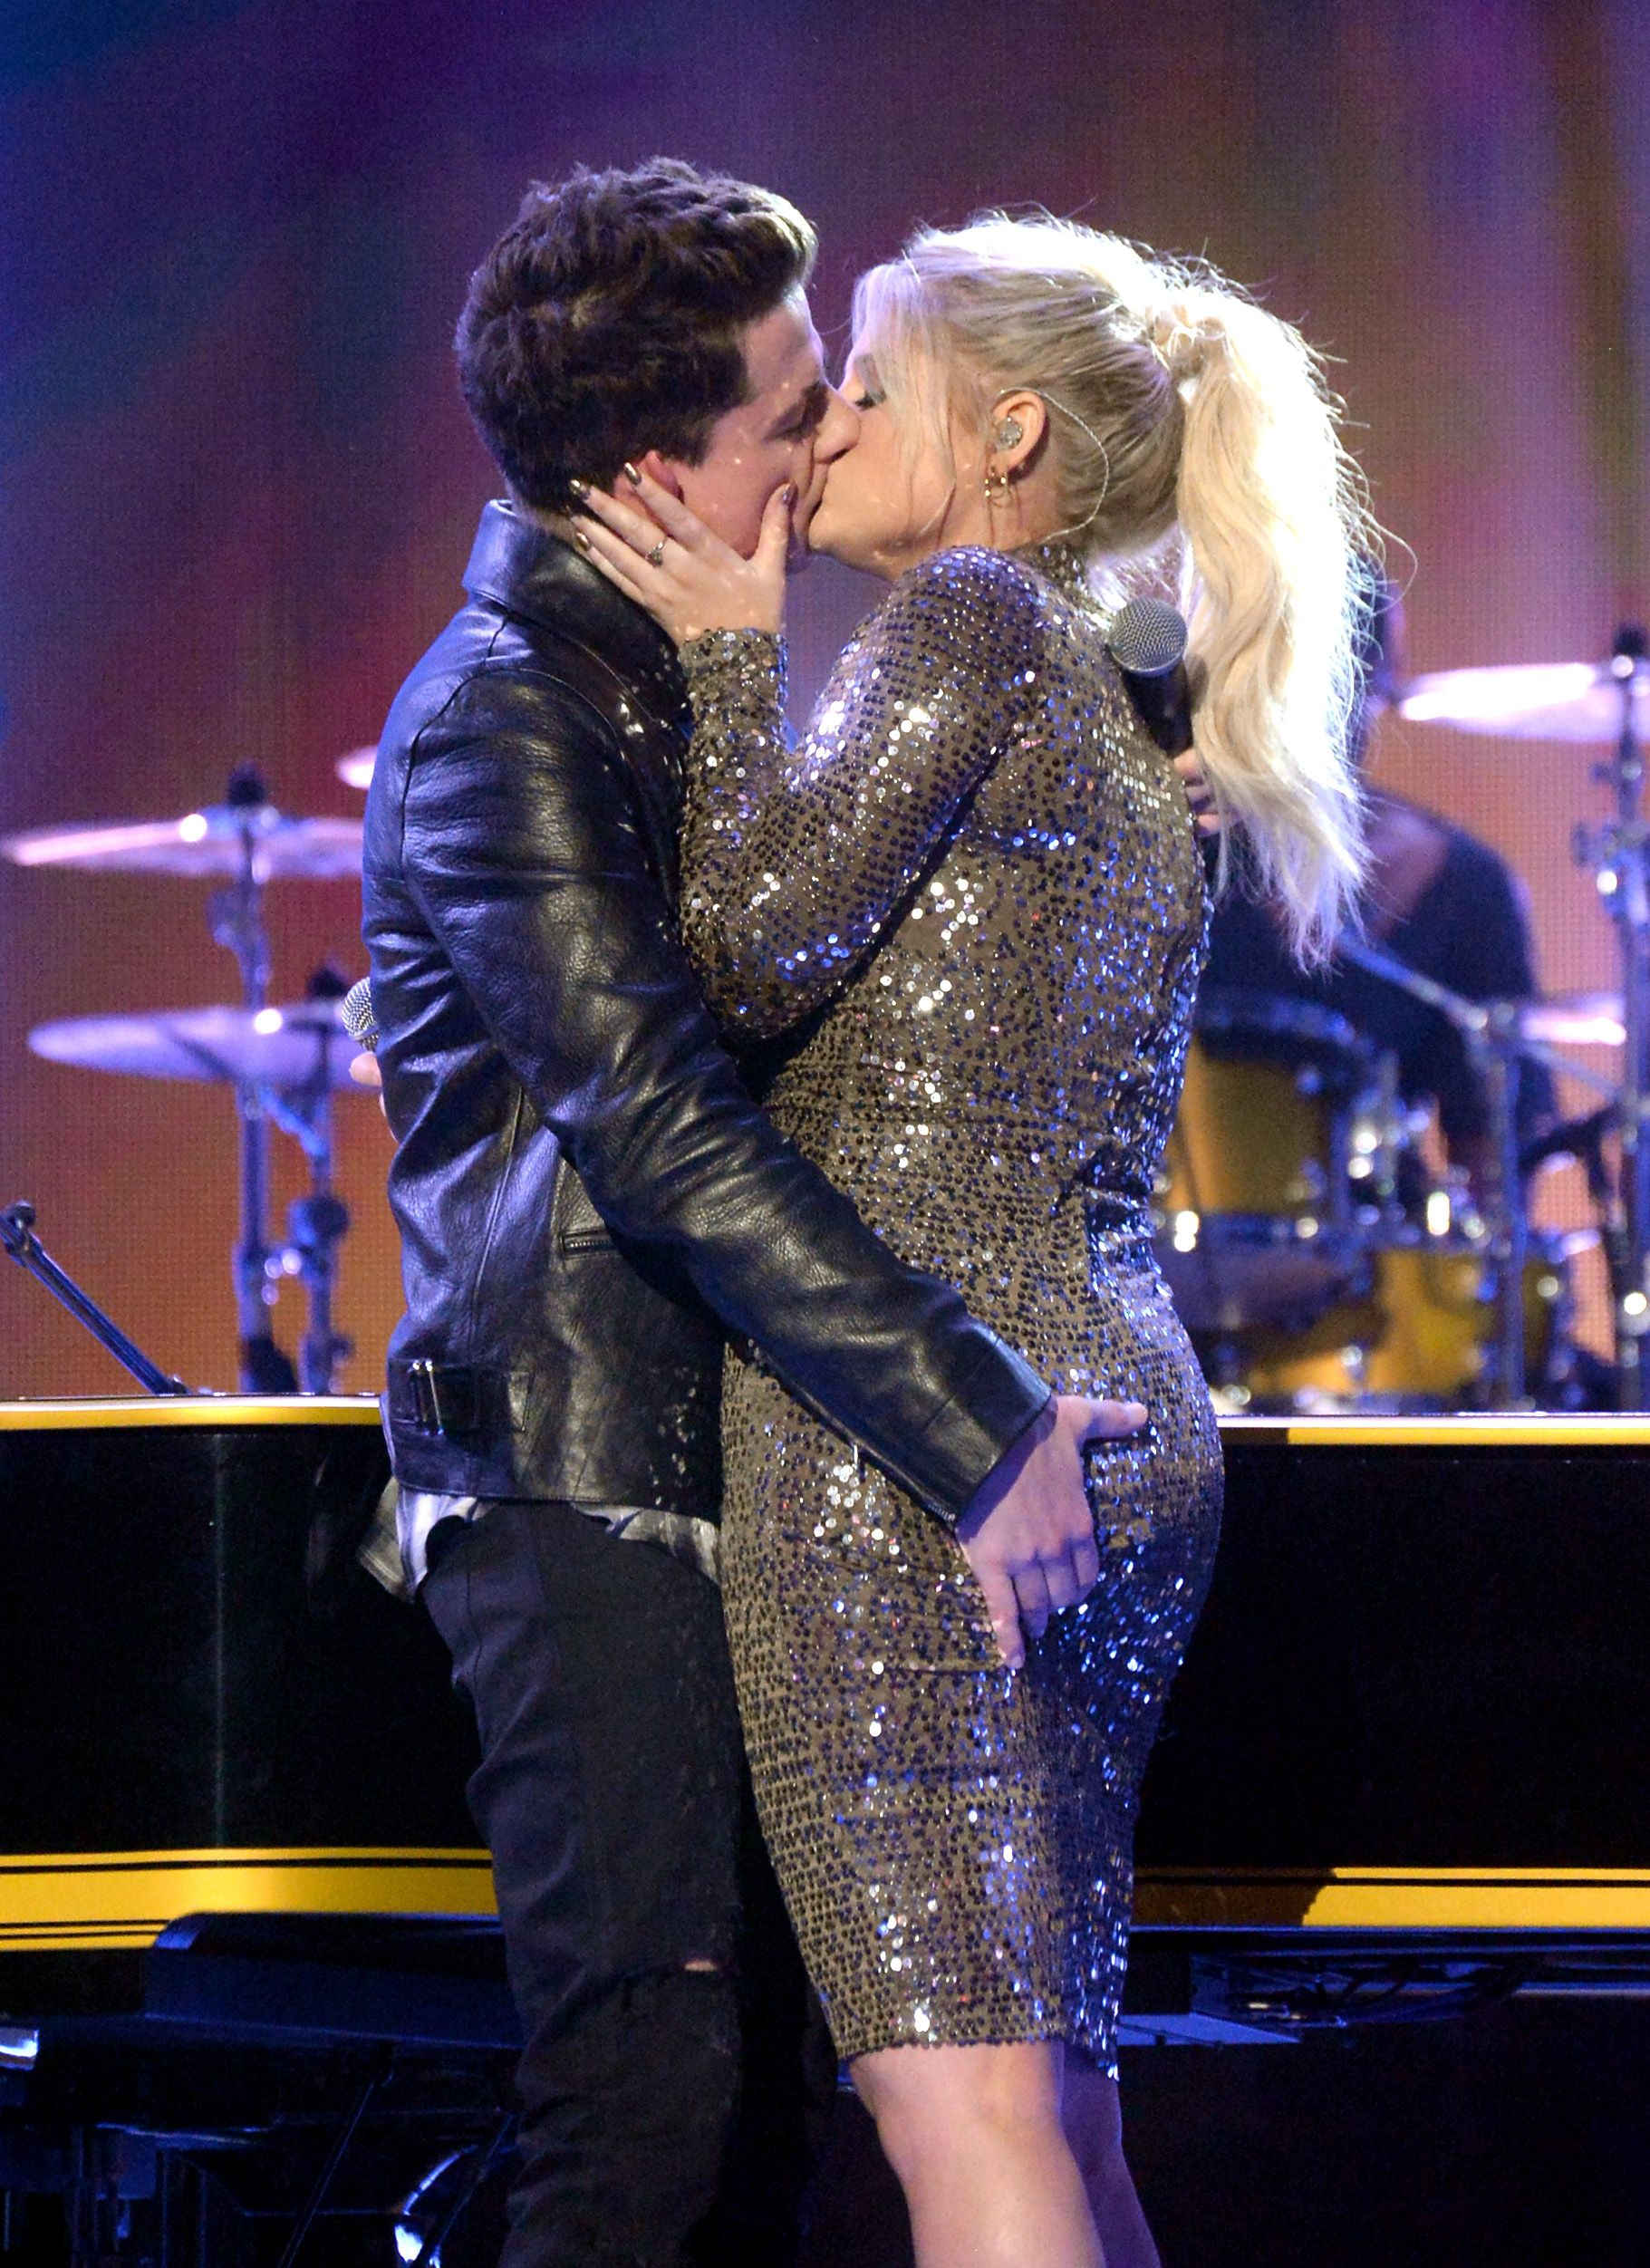 Charlie puth dating meghan trainor